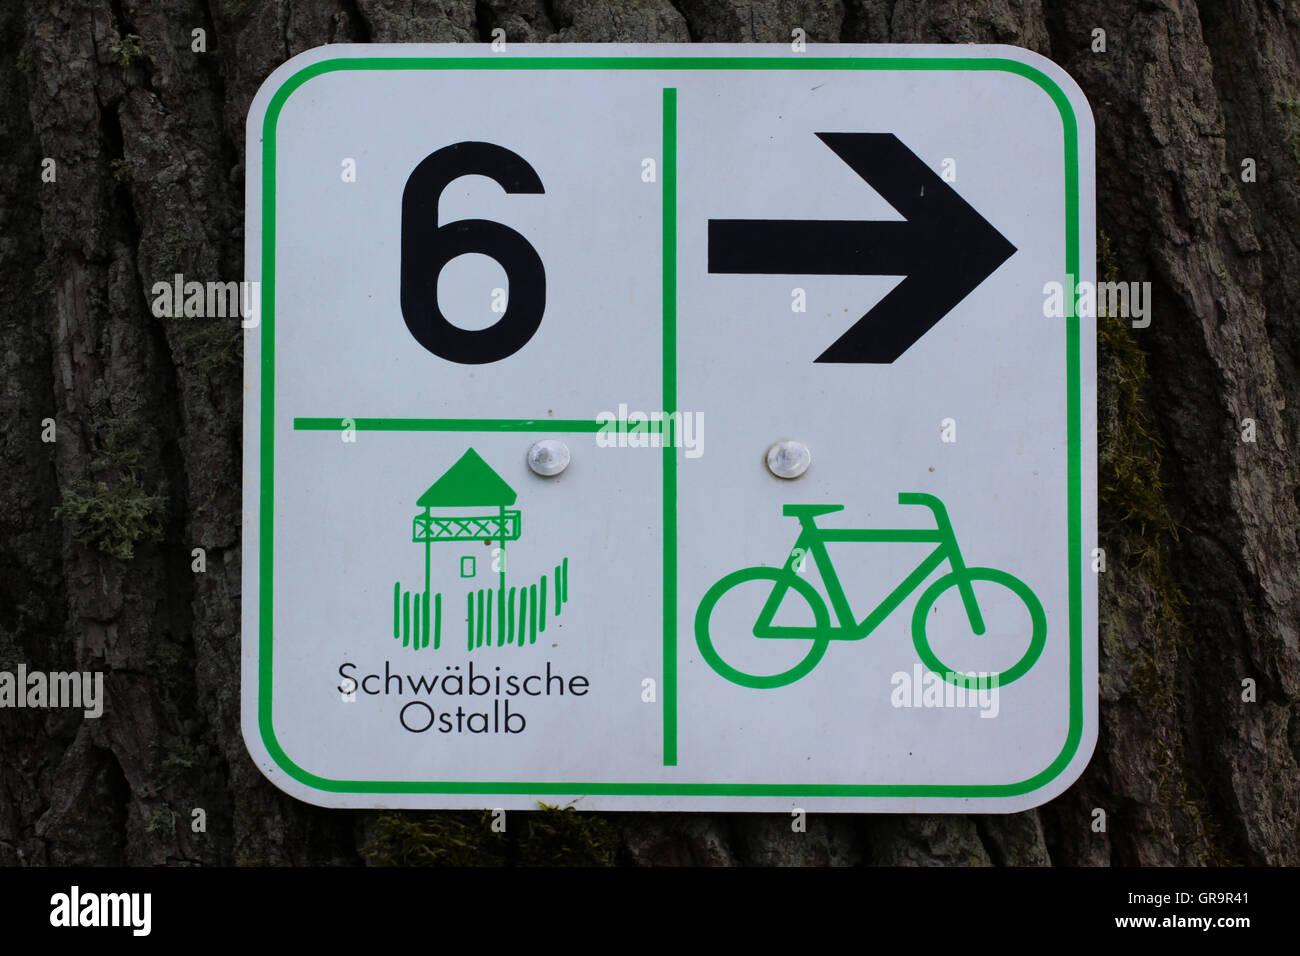 Cycleway - Stock Image